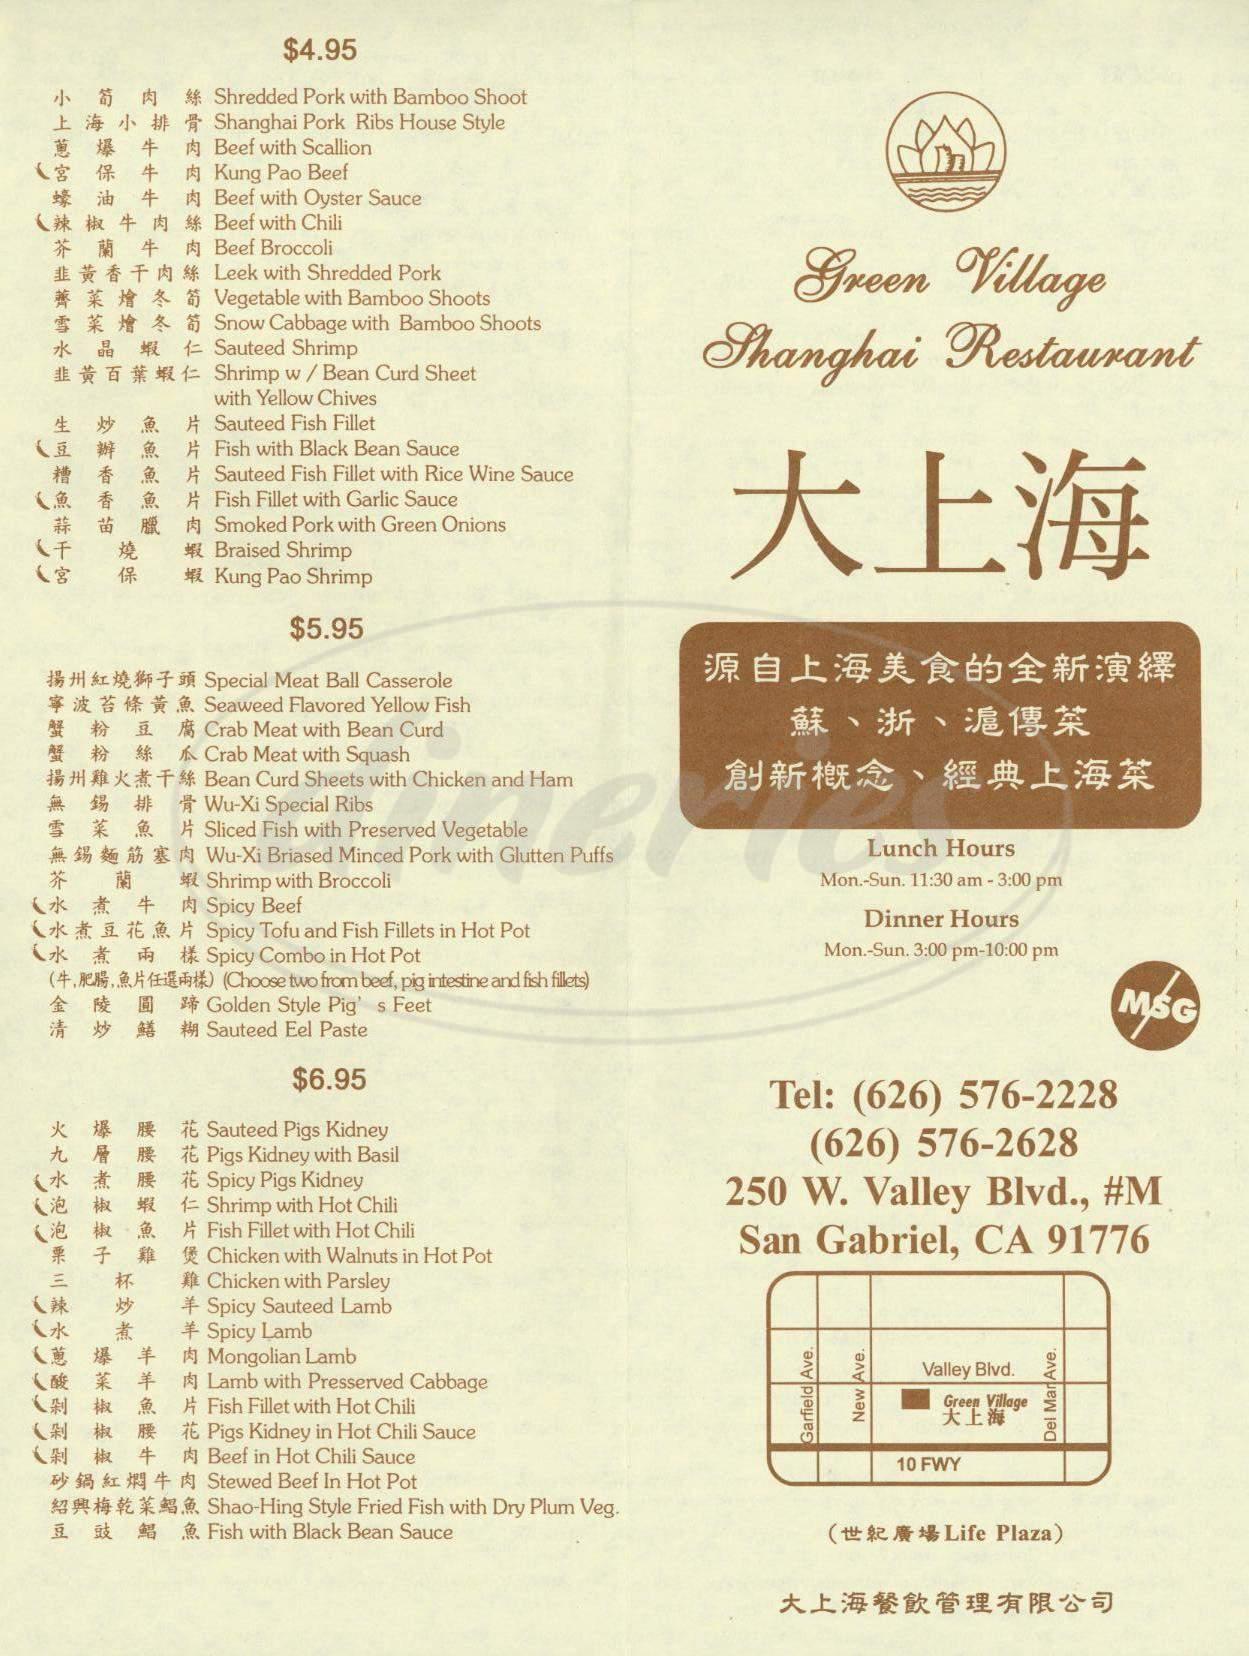 menu for Green Village Shanghai Restaurant